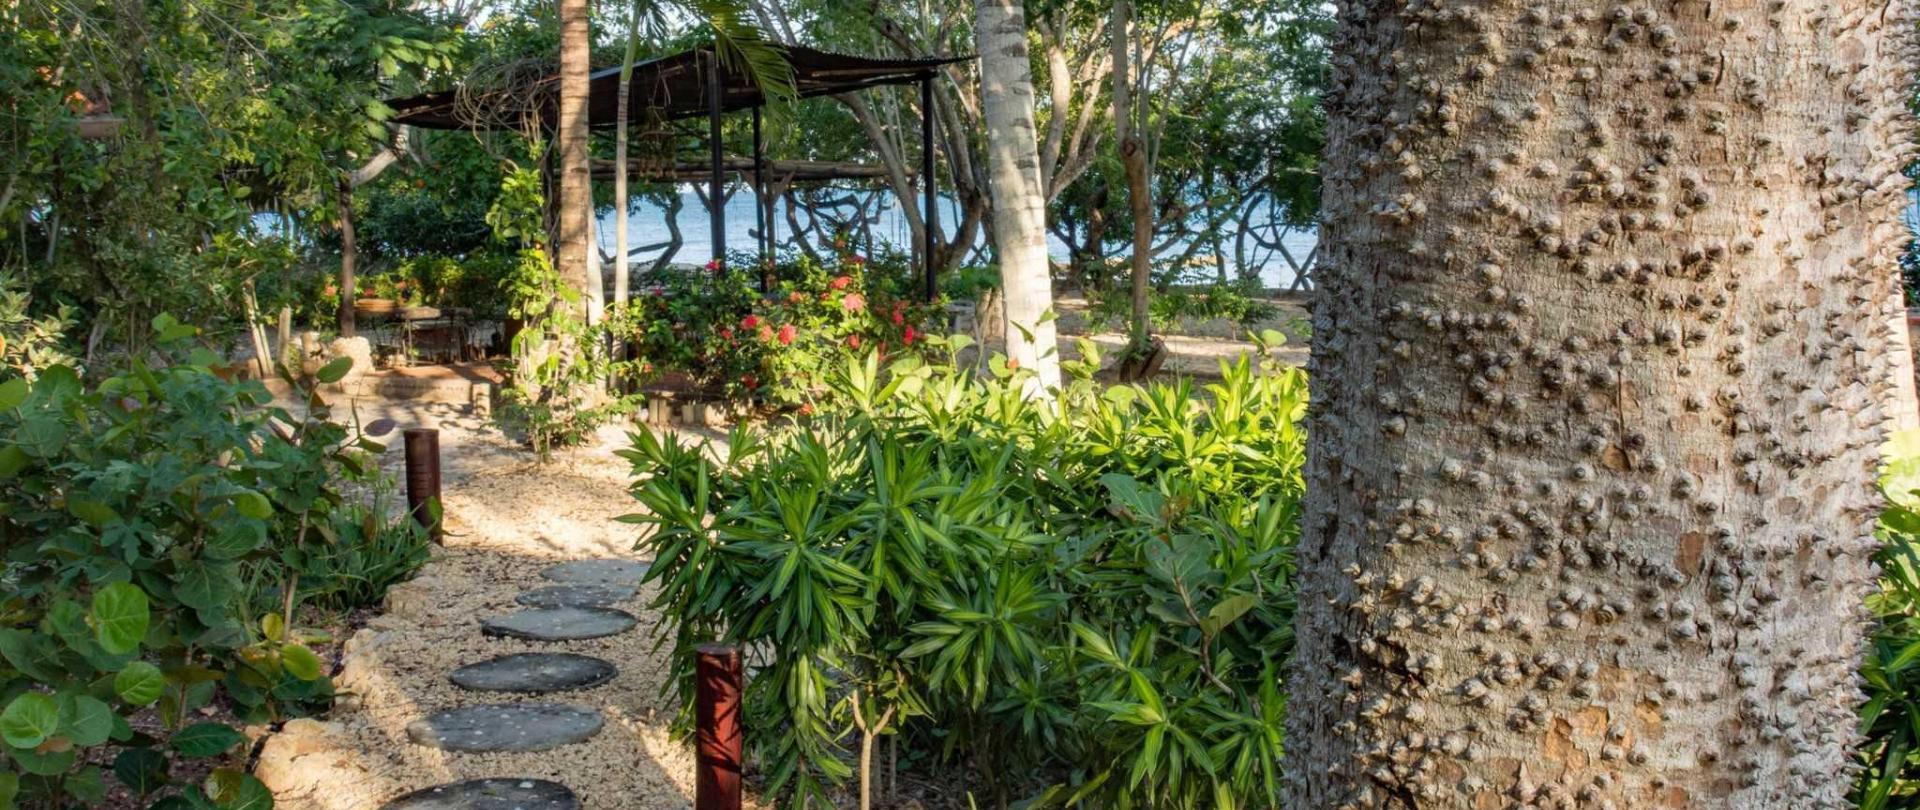 hotel-playa-manglares-36-1.jpg